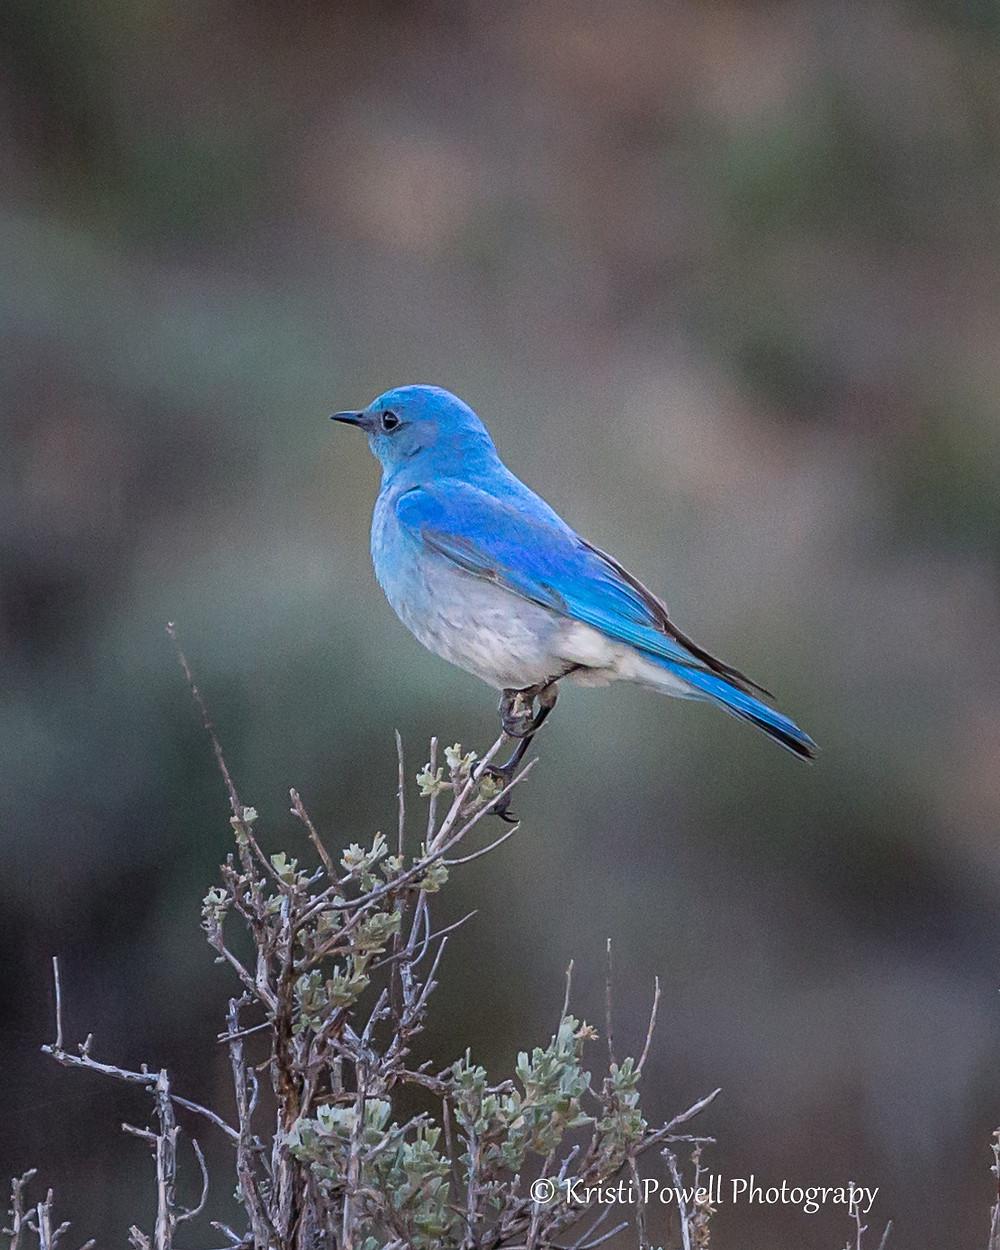 Adult Male Bluebird